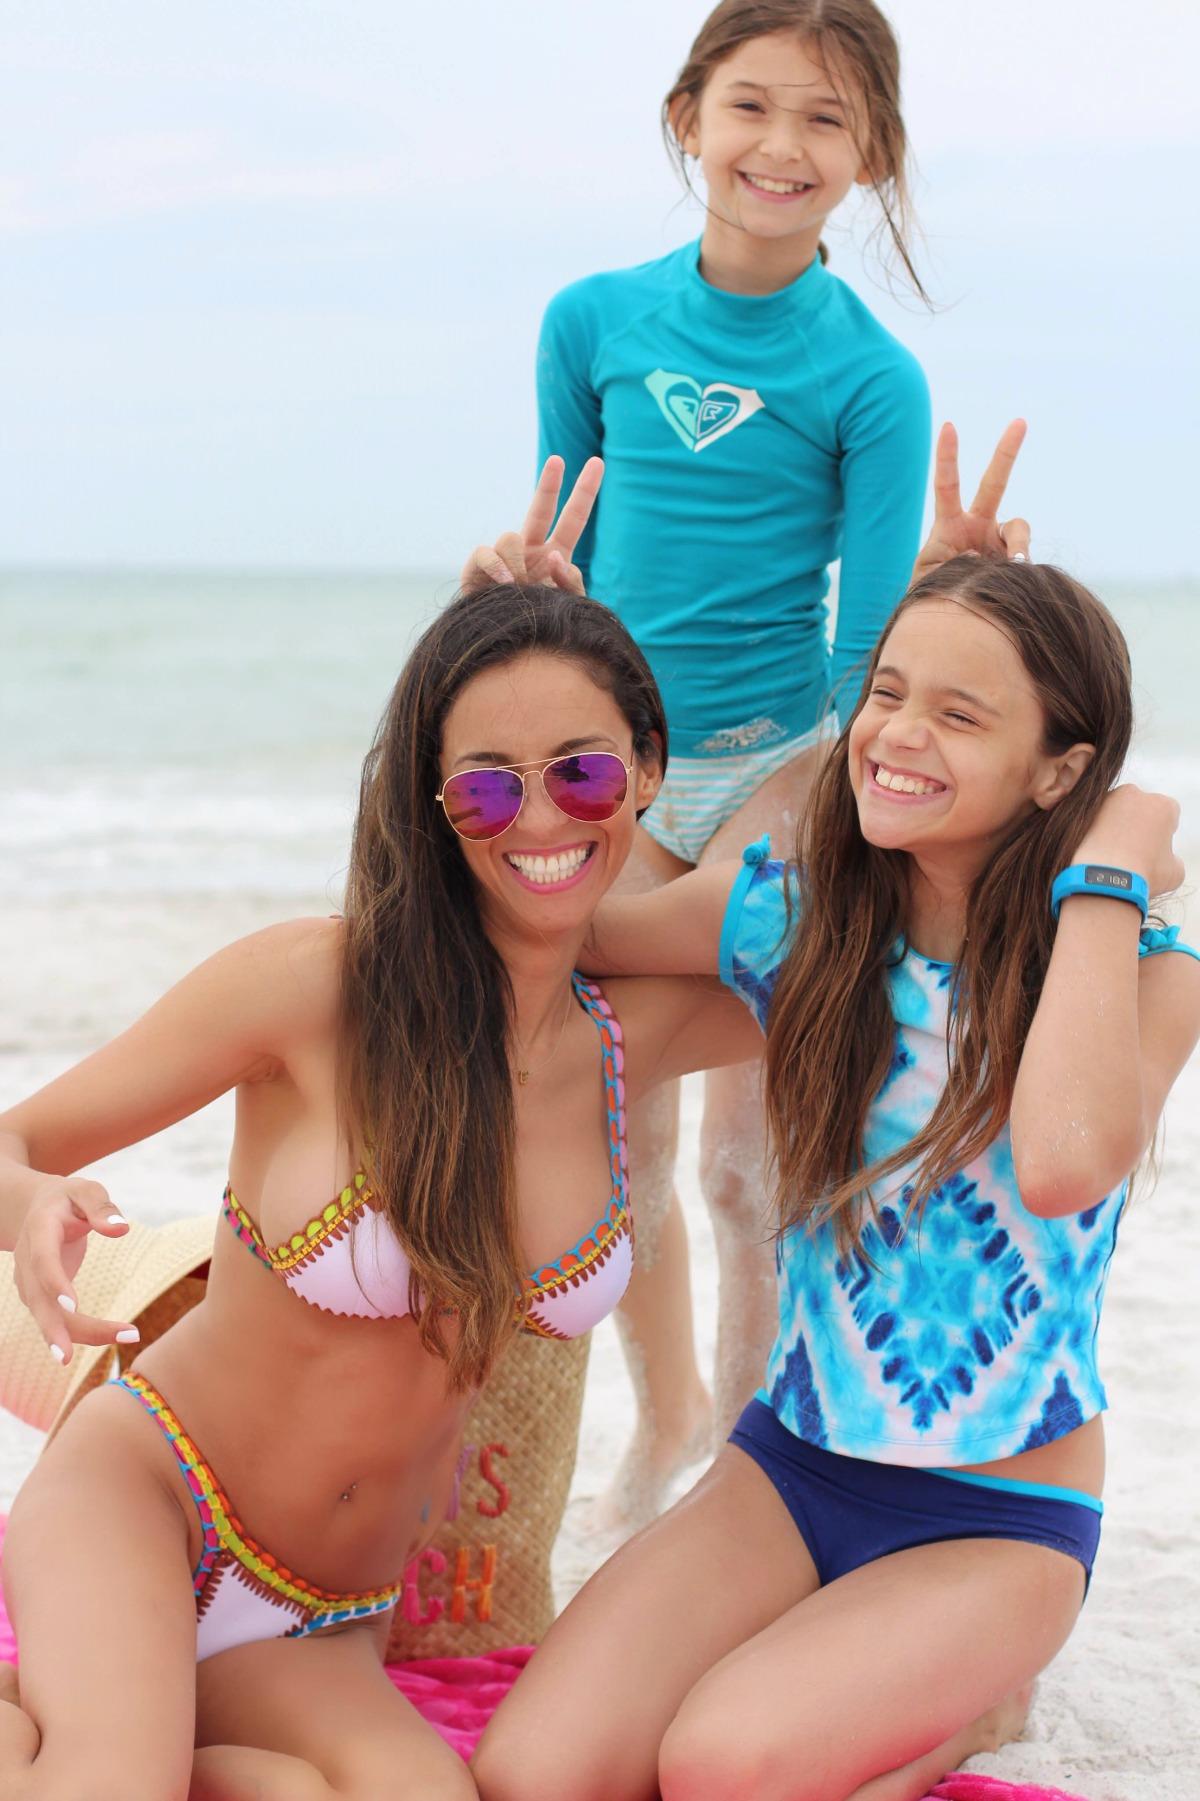 White neoprene brazilian cut bikini with crochet details